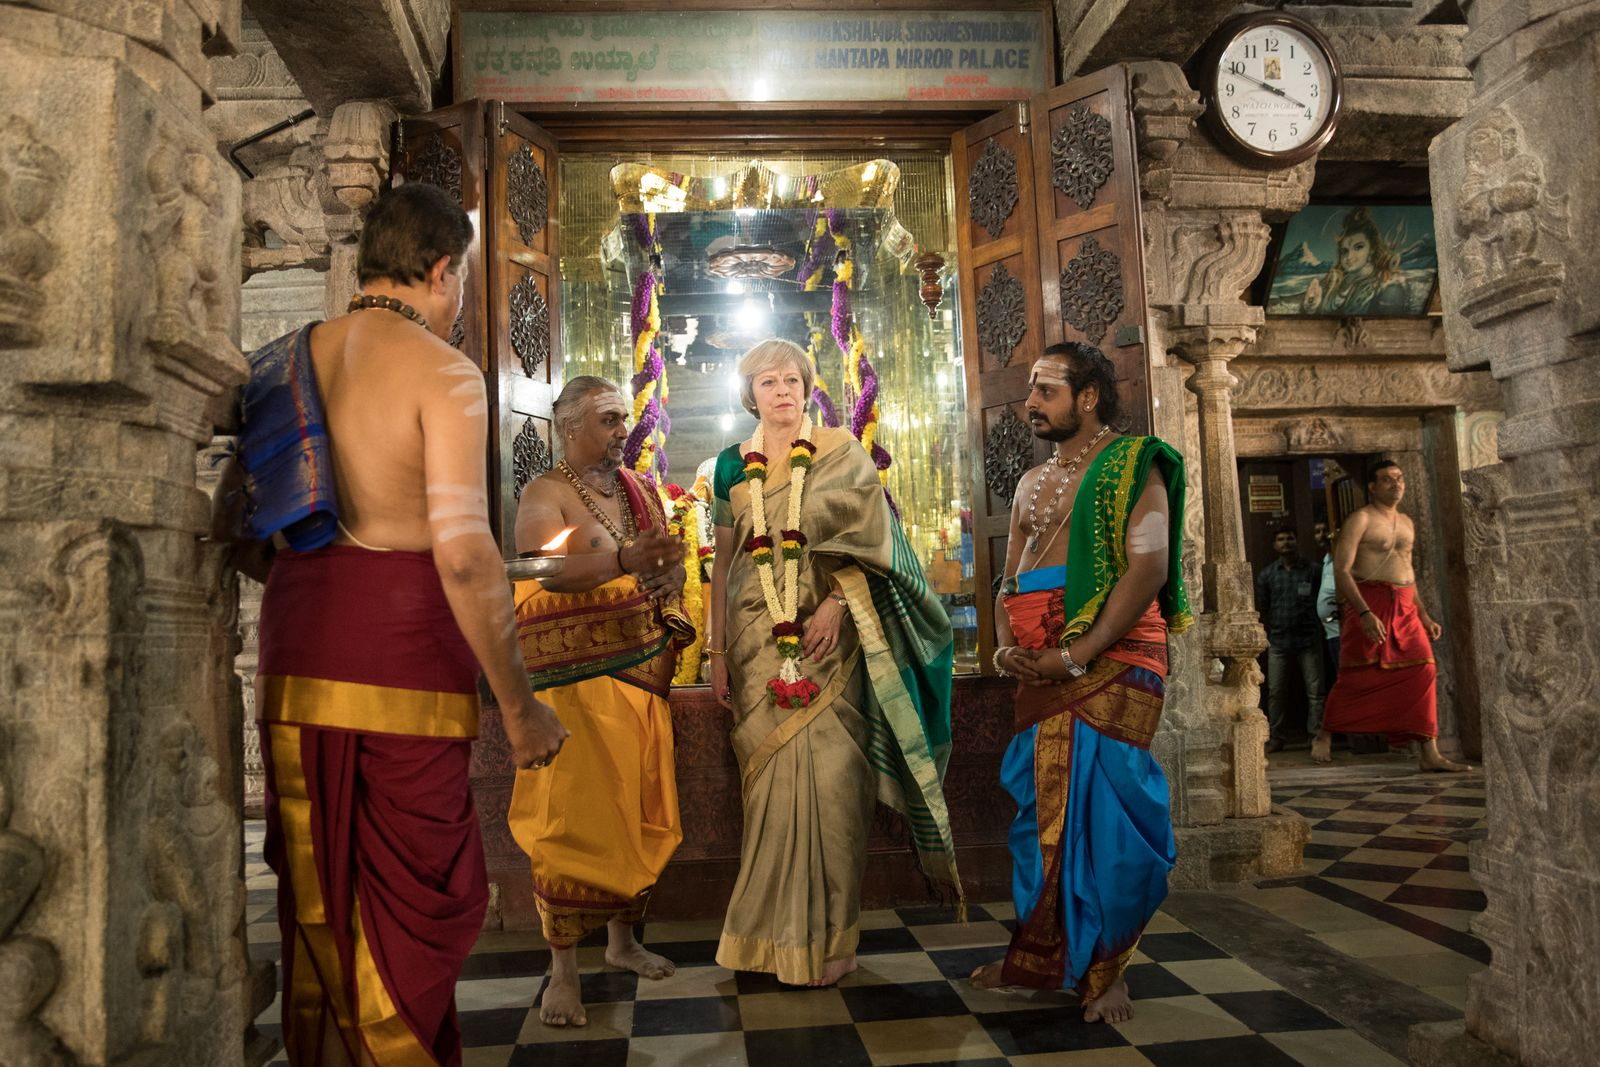 Theresa May Takes A British Trade Delegation To India - Day 2